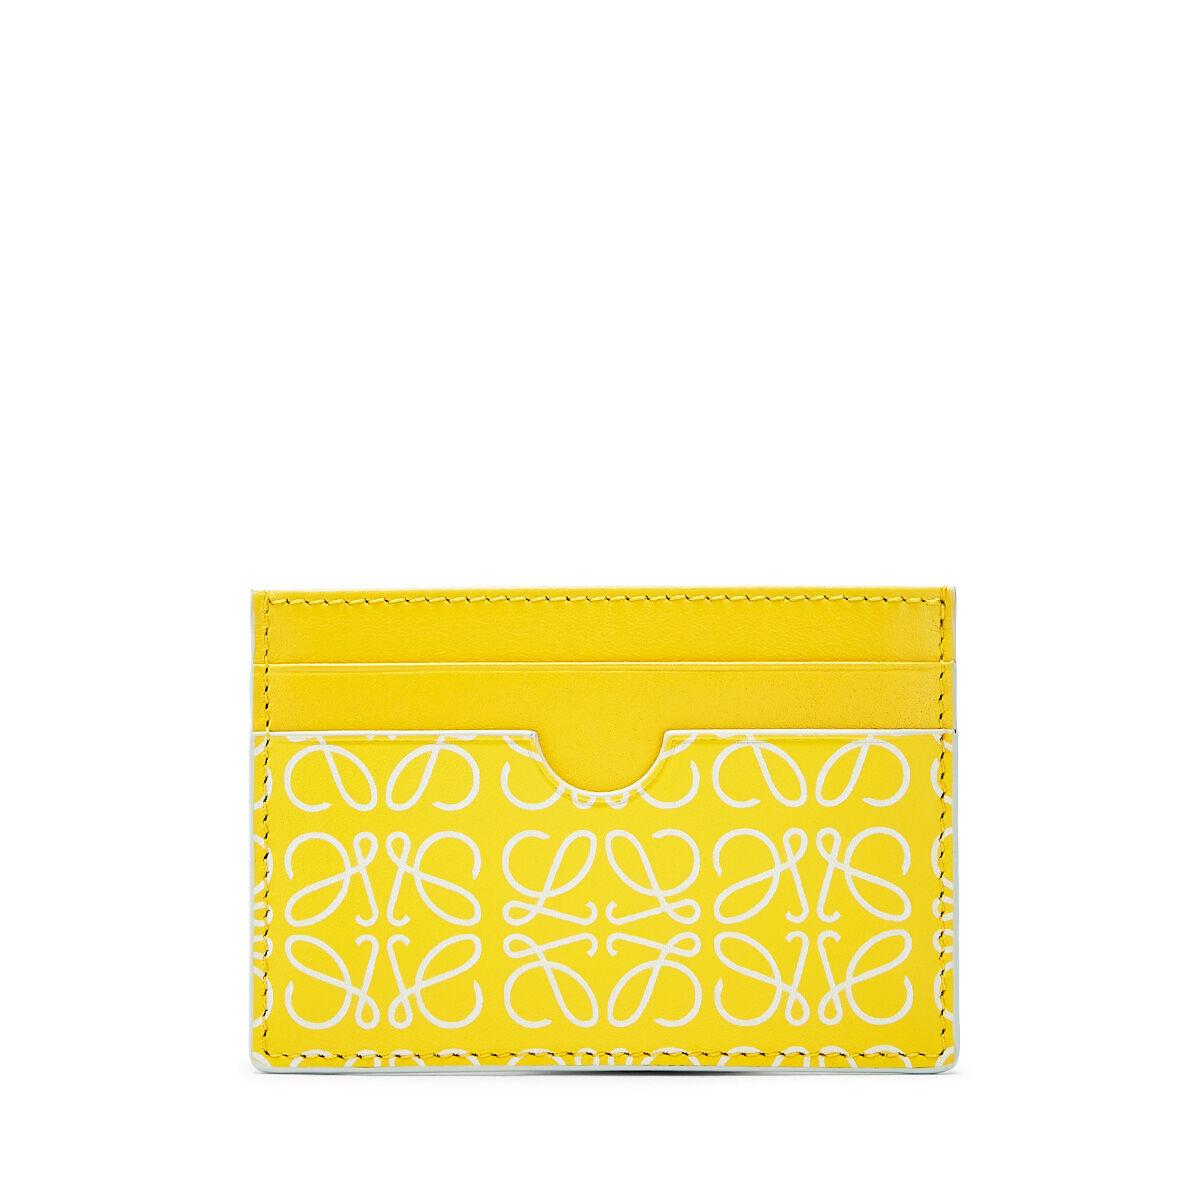 LOEWE Plain Card Holder Yellow/White front